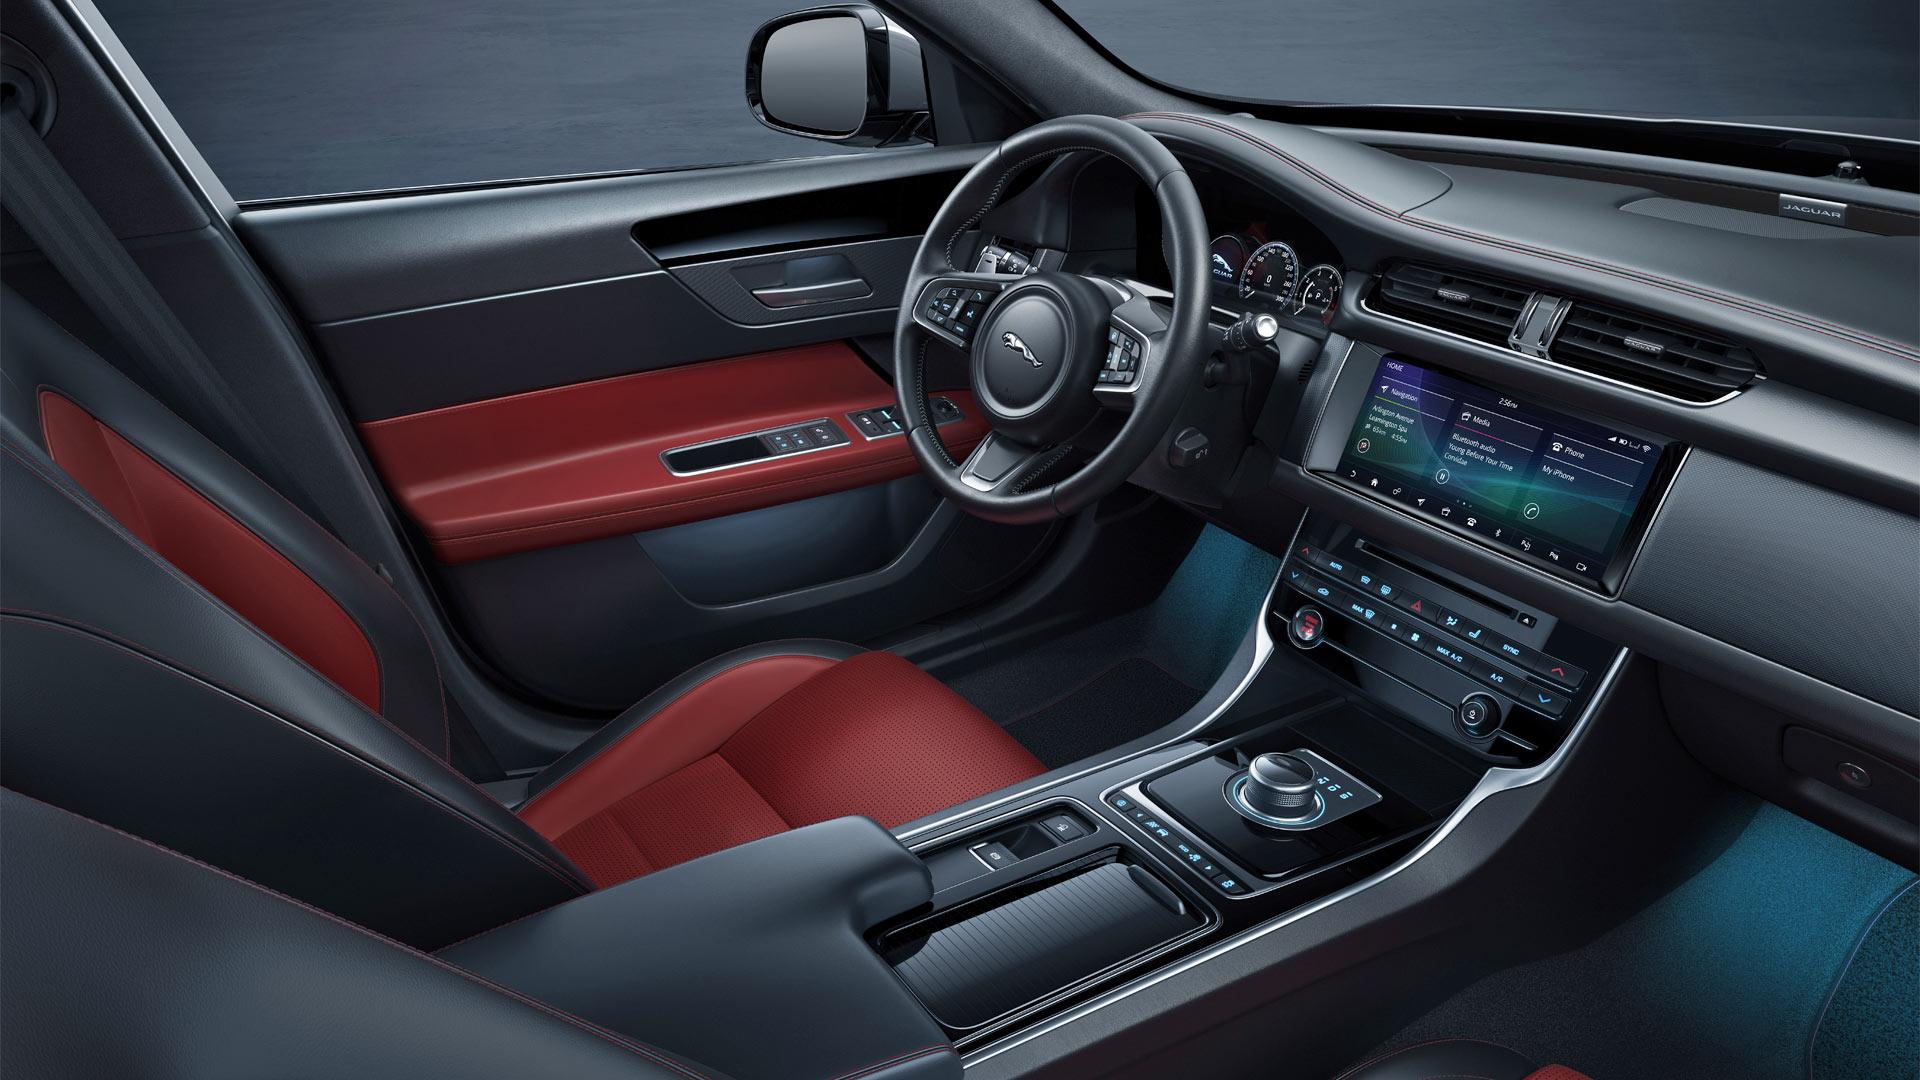 Jaguar-XF-Chequered-Flag-special-edition-Interior_2